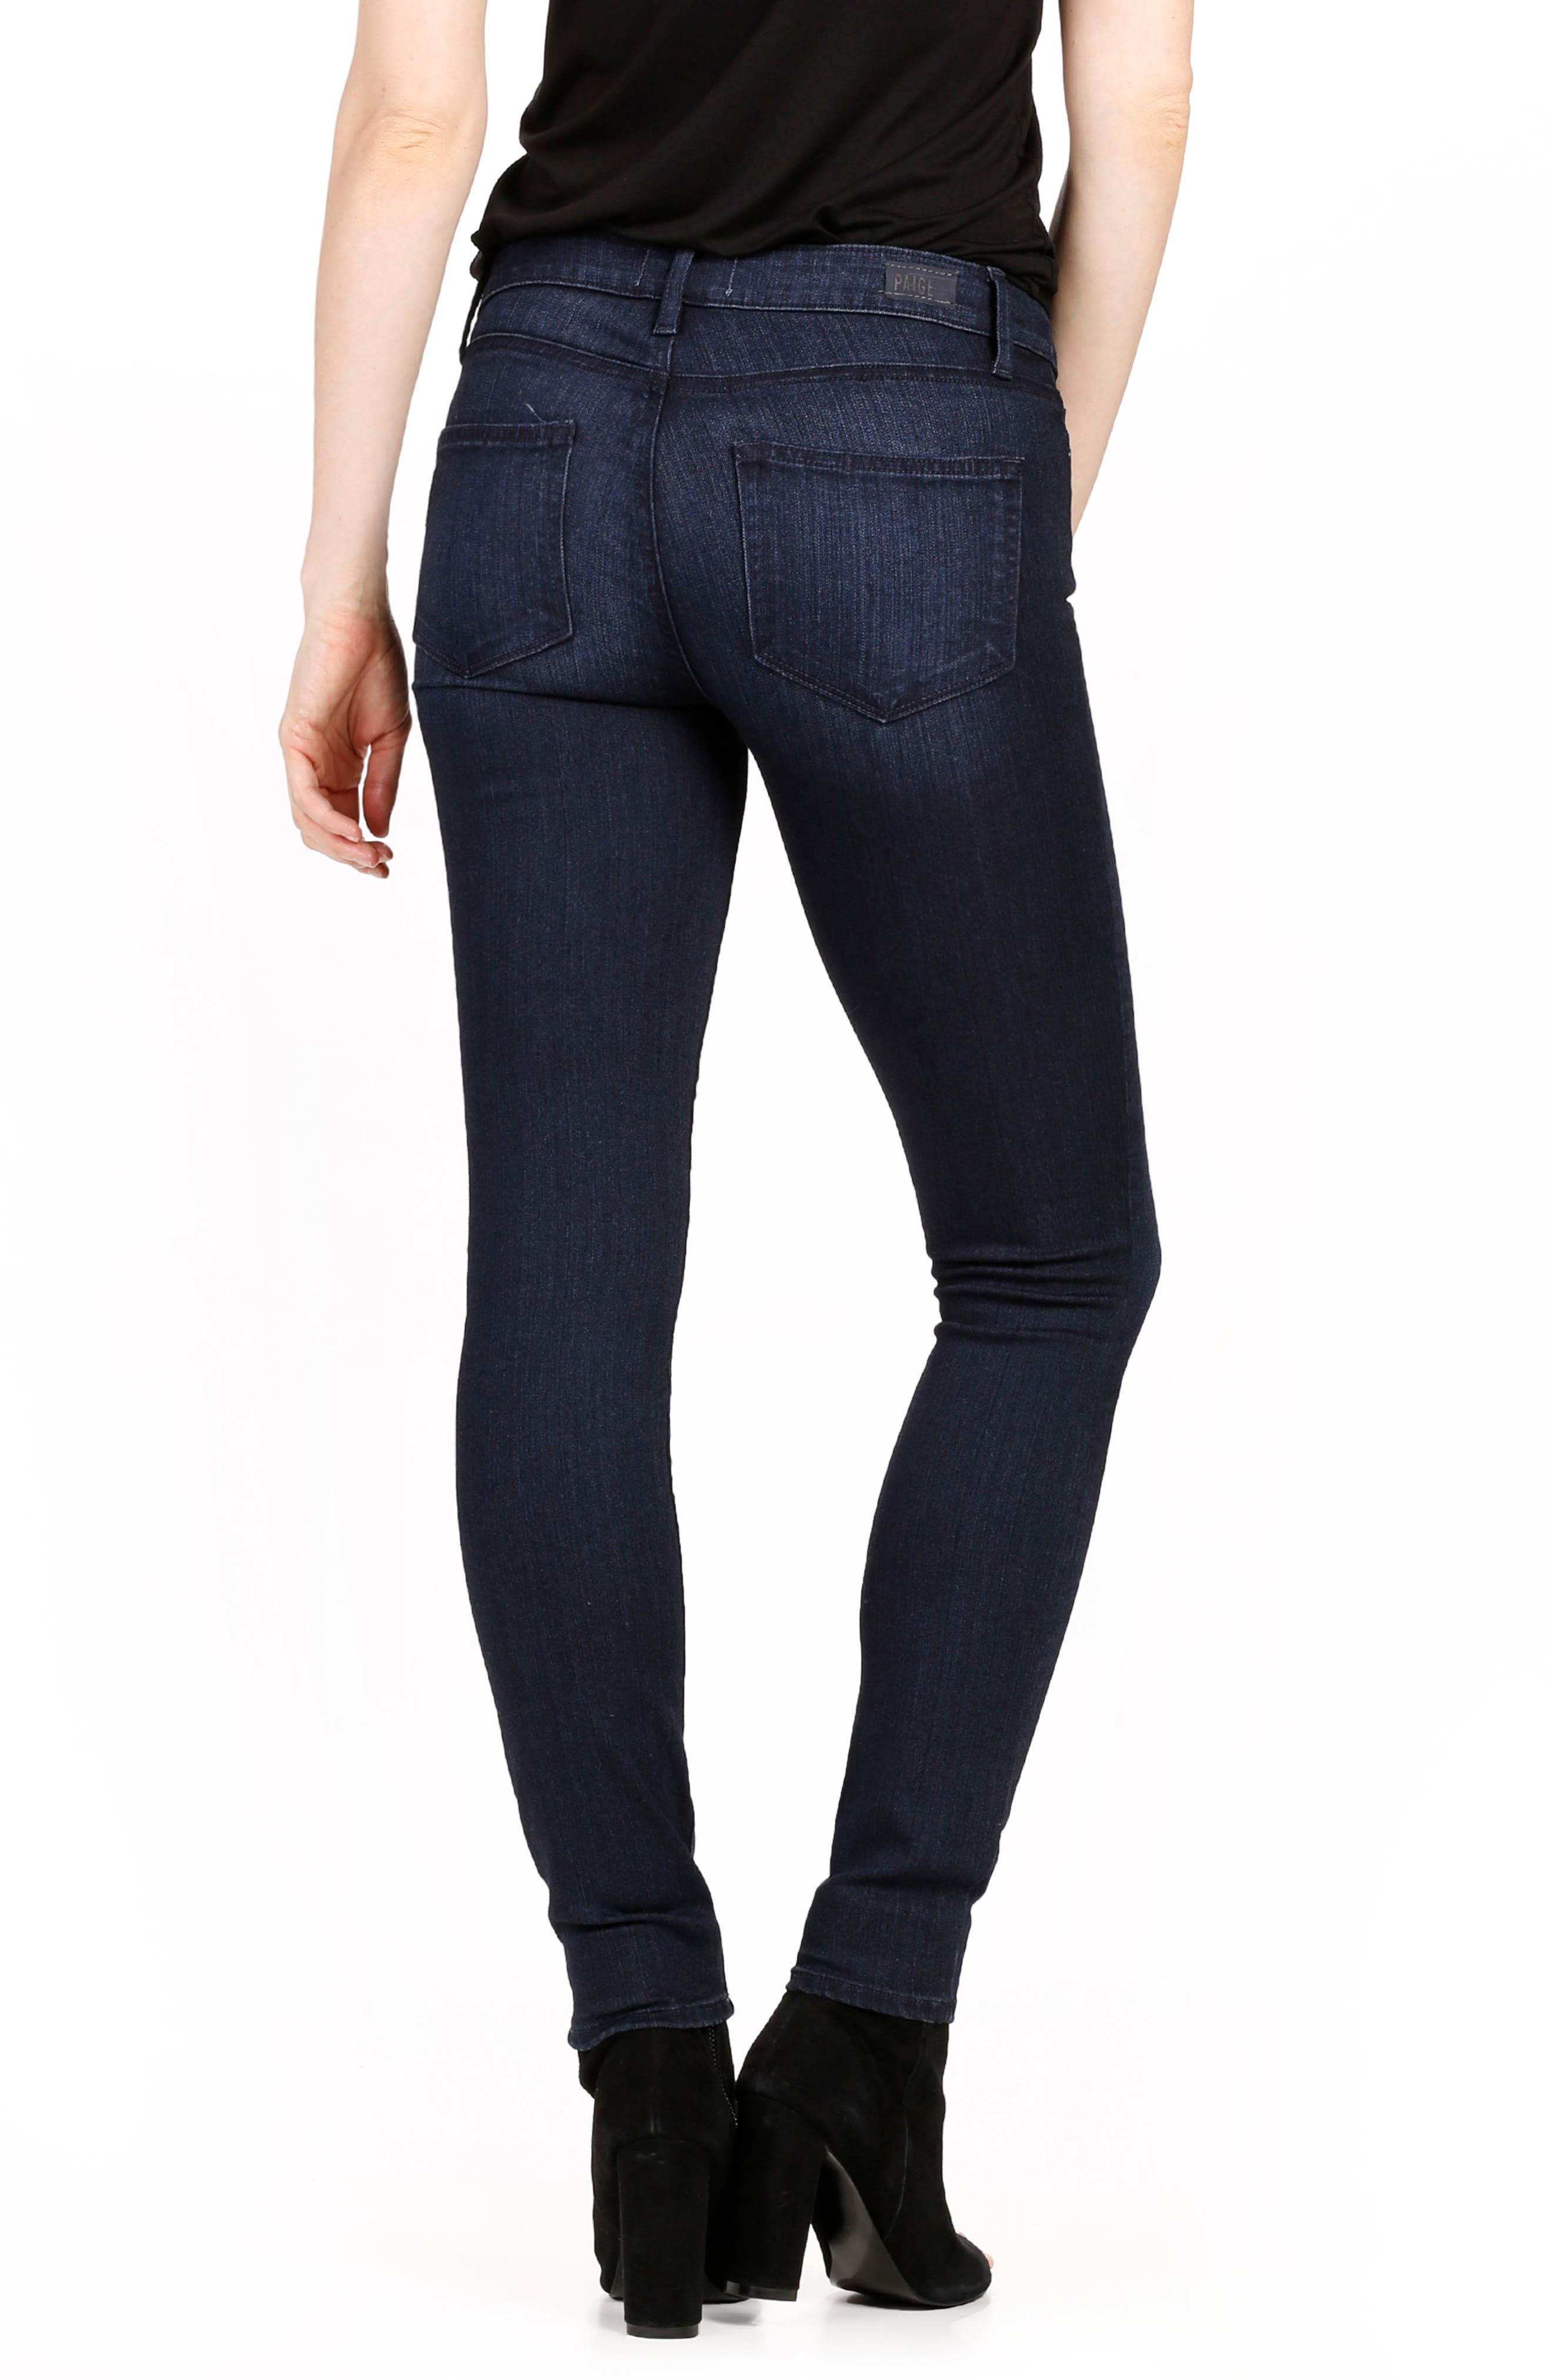 Transcend - Verdugo Ultra Skinny Jeans,                             Alternate thumbnail 2, color,